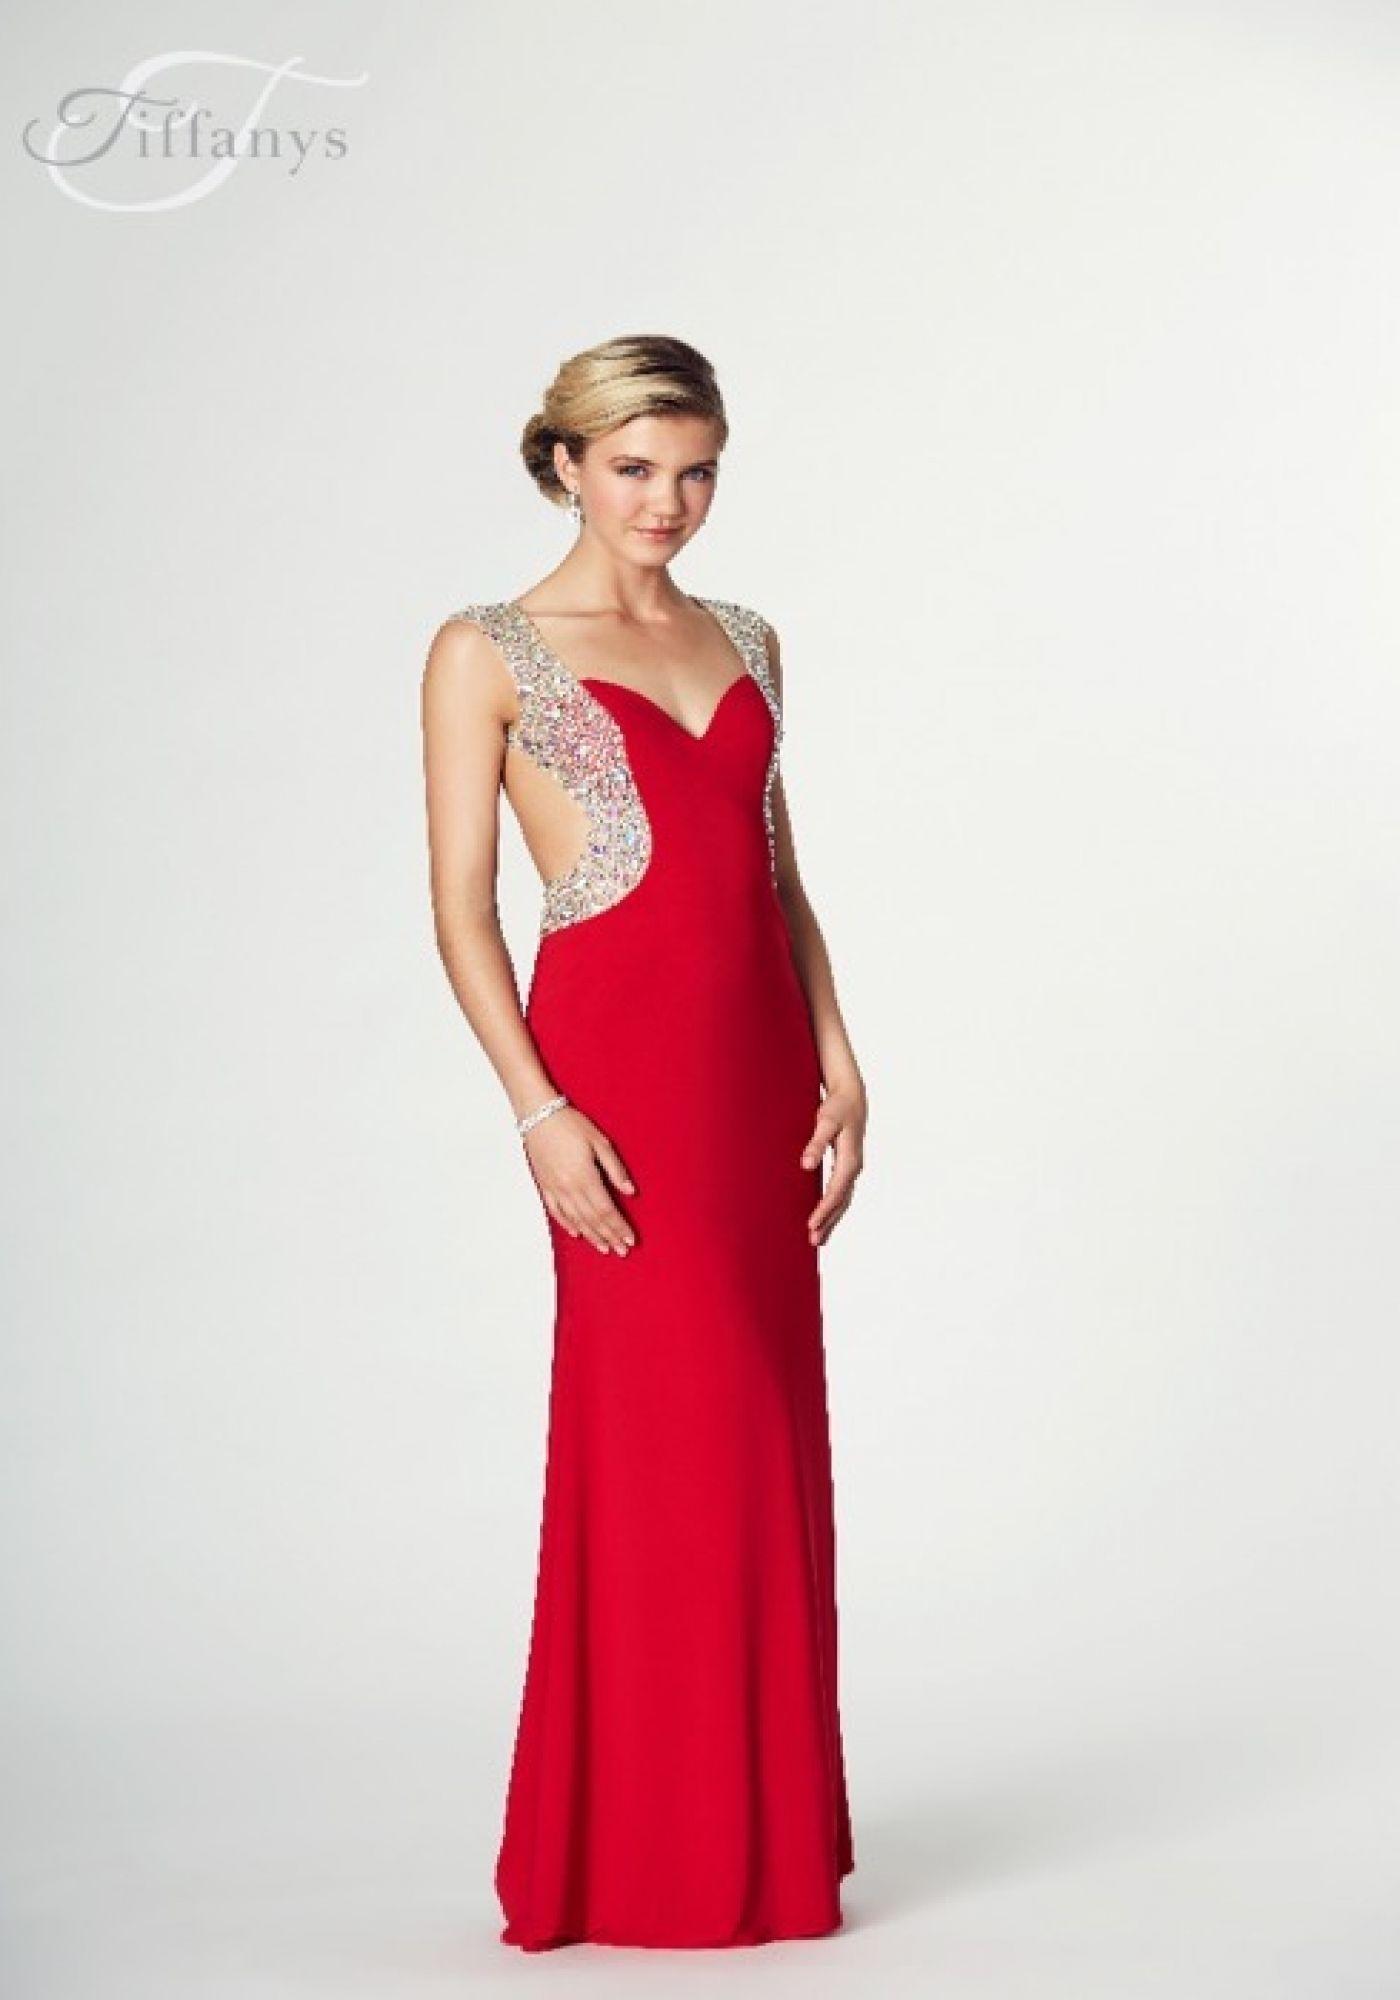 Tolle Sherri Hügel Rot Prom Kleid 2014 Galerie - Brautkleider Ideen ...